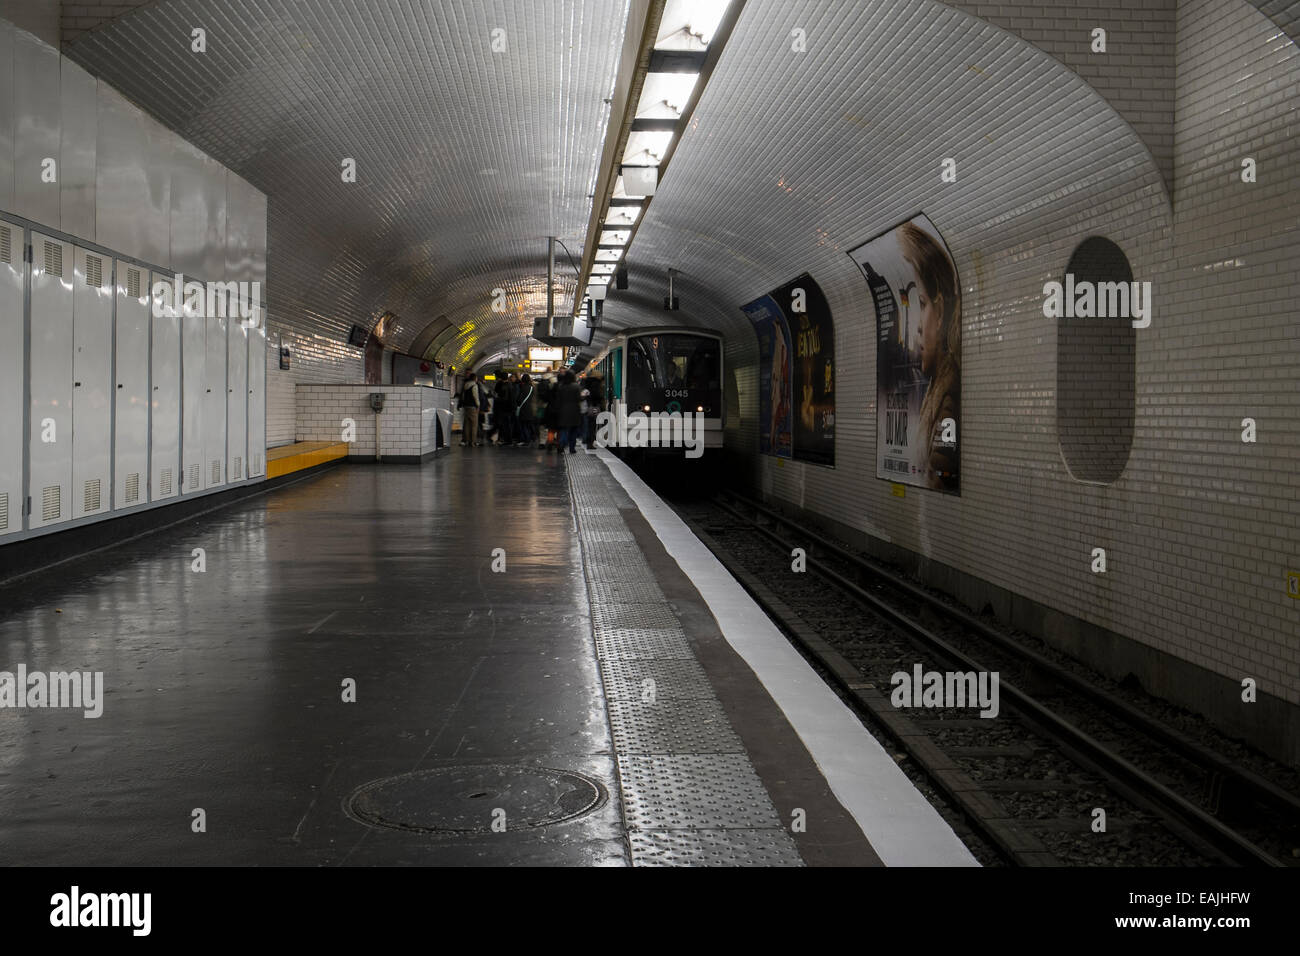 Paris Metro train arriving at a station, Paris France - Stock Image